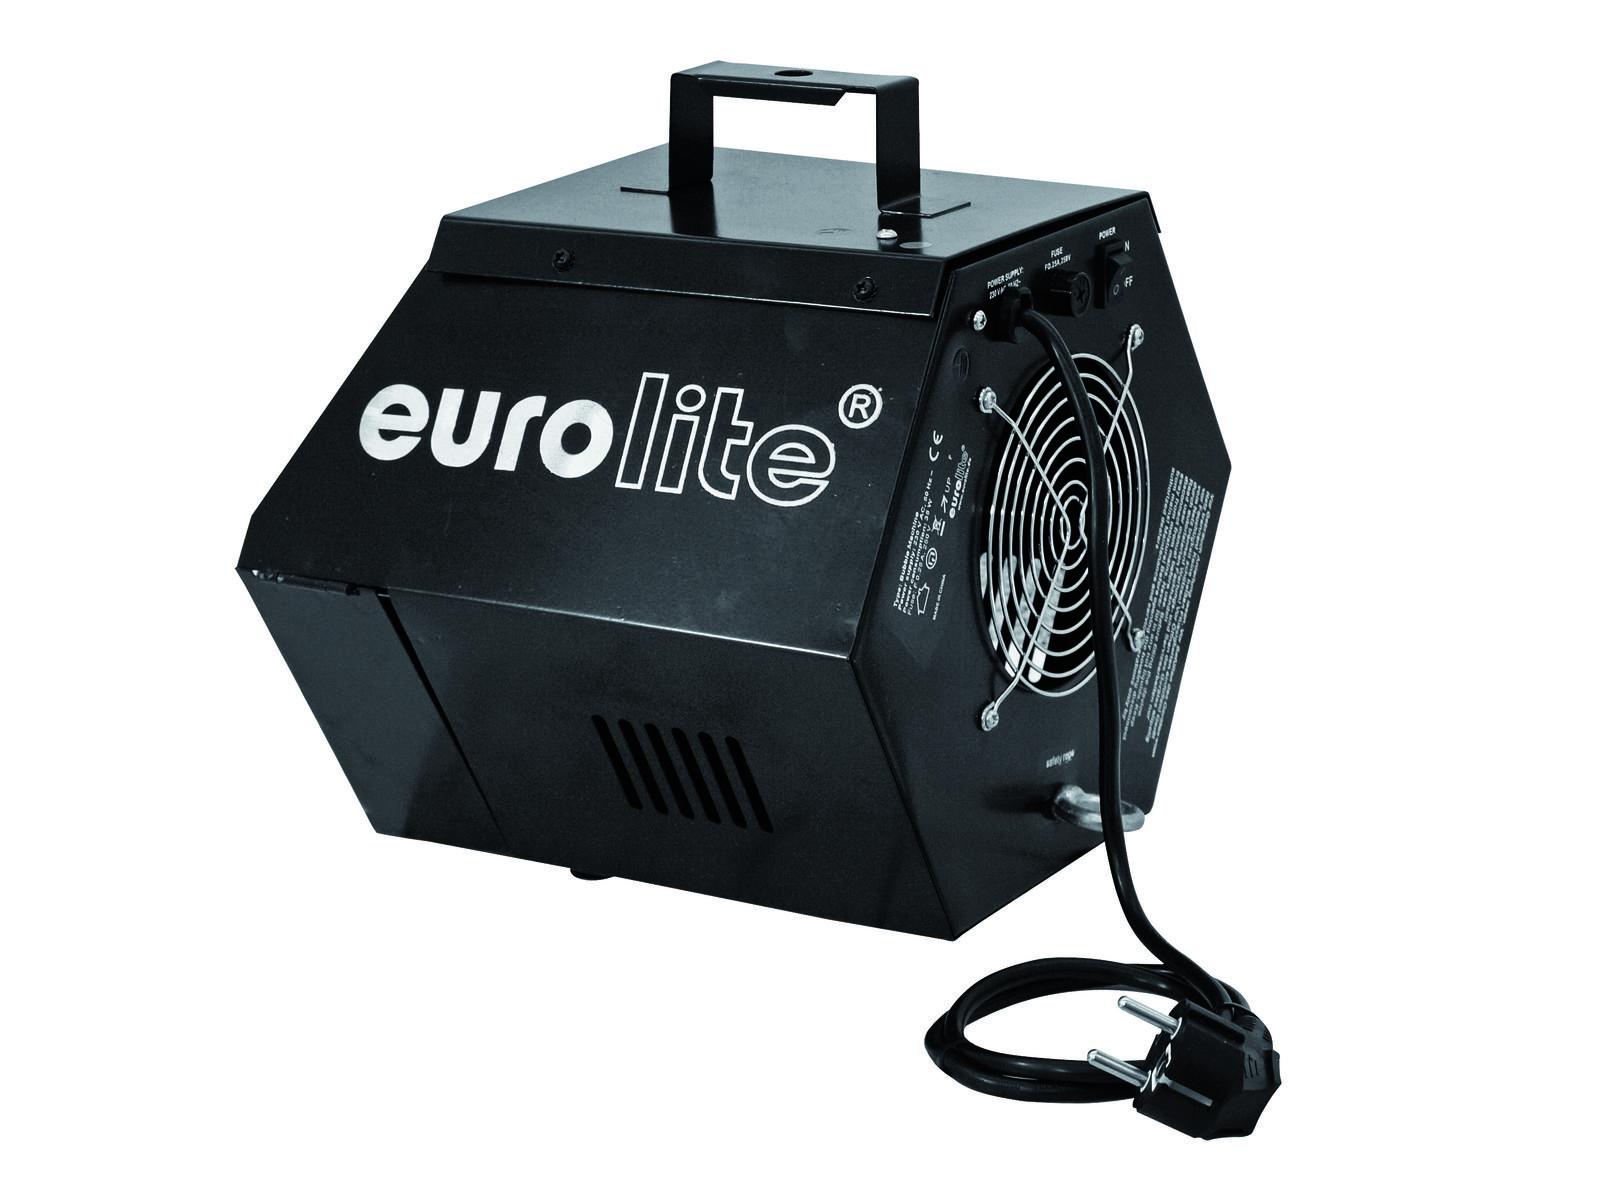 eurolite bubble machine black wytwornica baniek. Black Bedroom Furniture Sets. Home Design Ideas